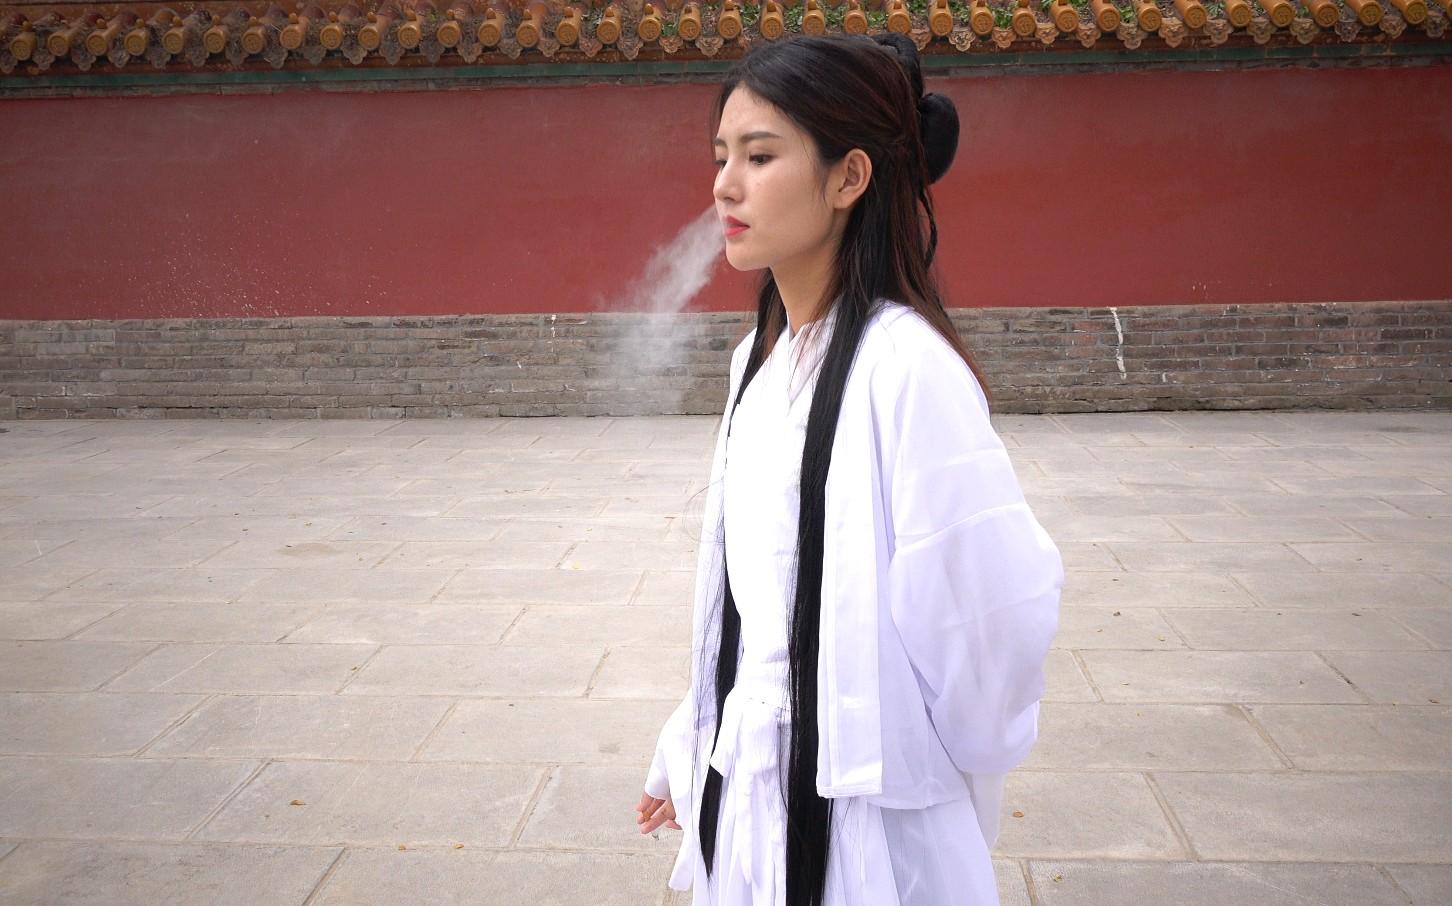 【K&M】KM芮芮超美古装小姐姐吸烟